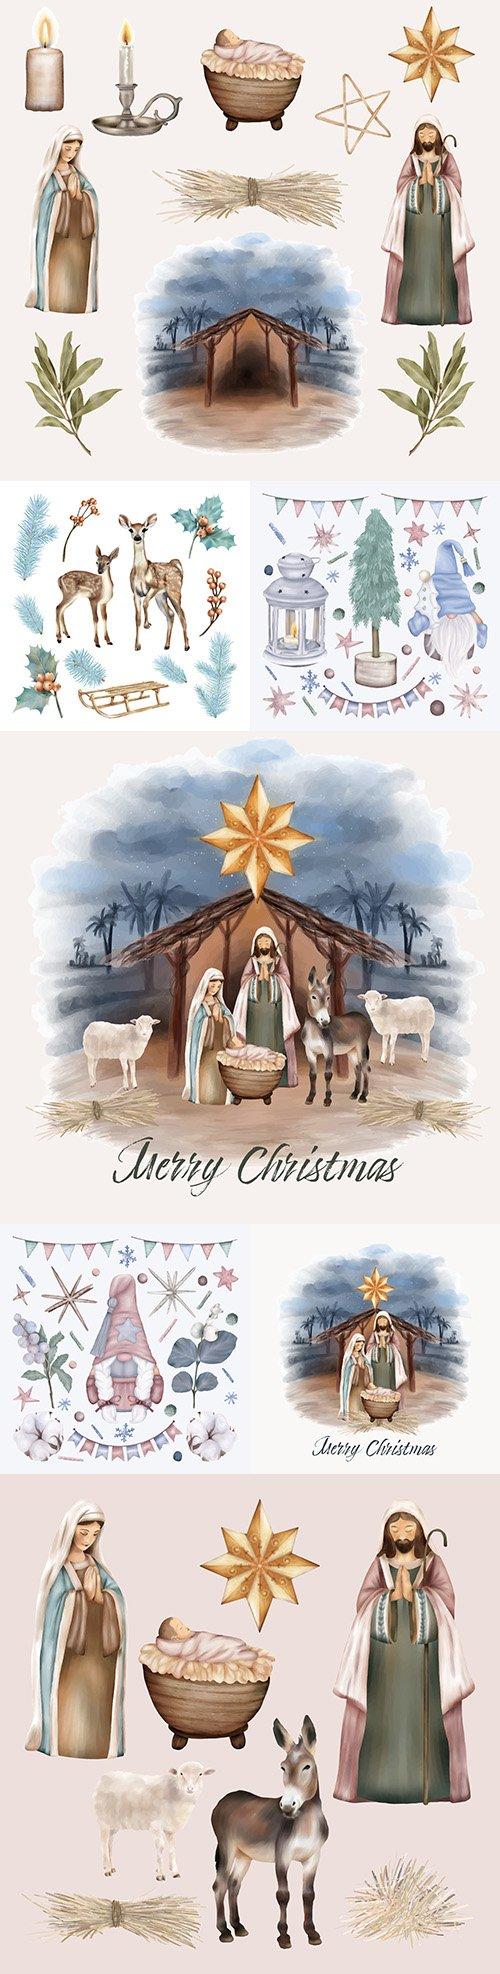 Christmas set Baby Jesus and Virgin Mary Illustration